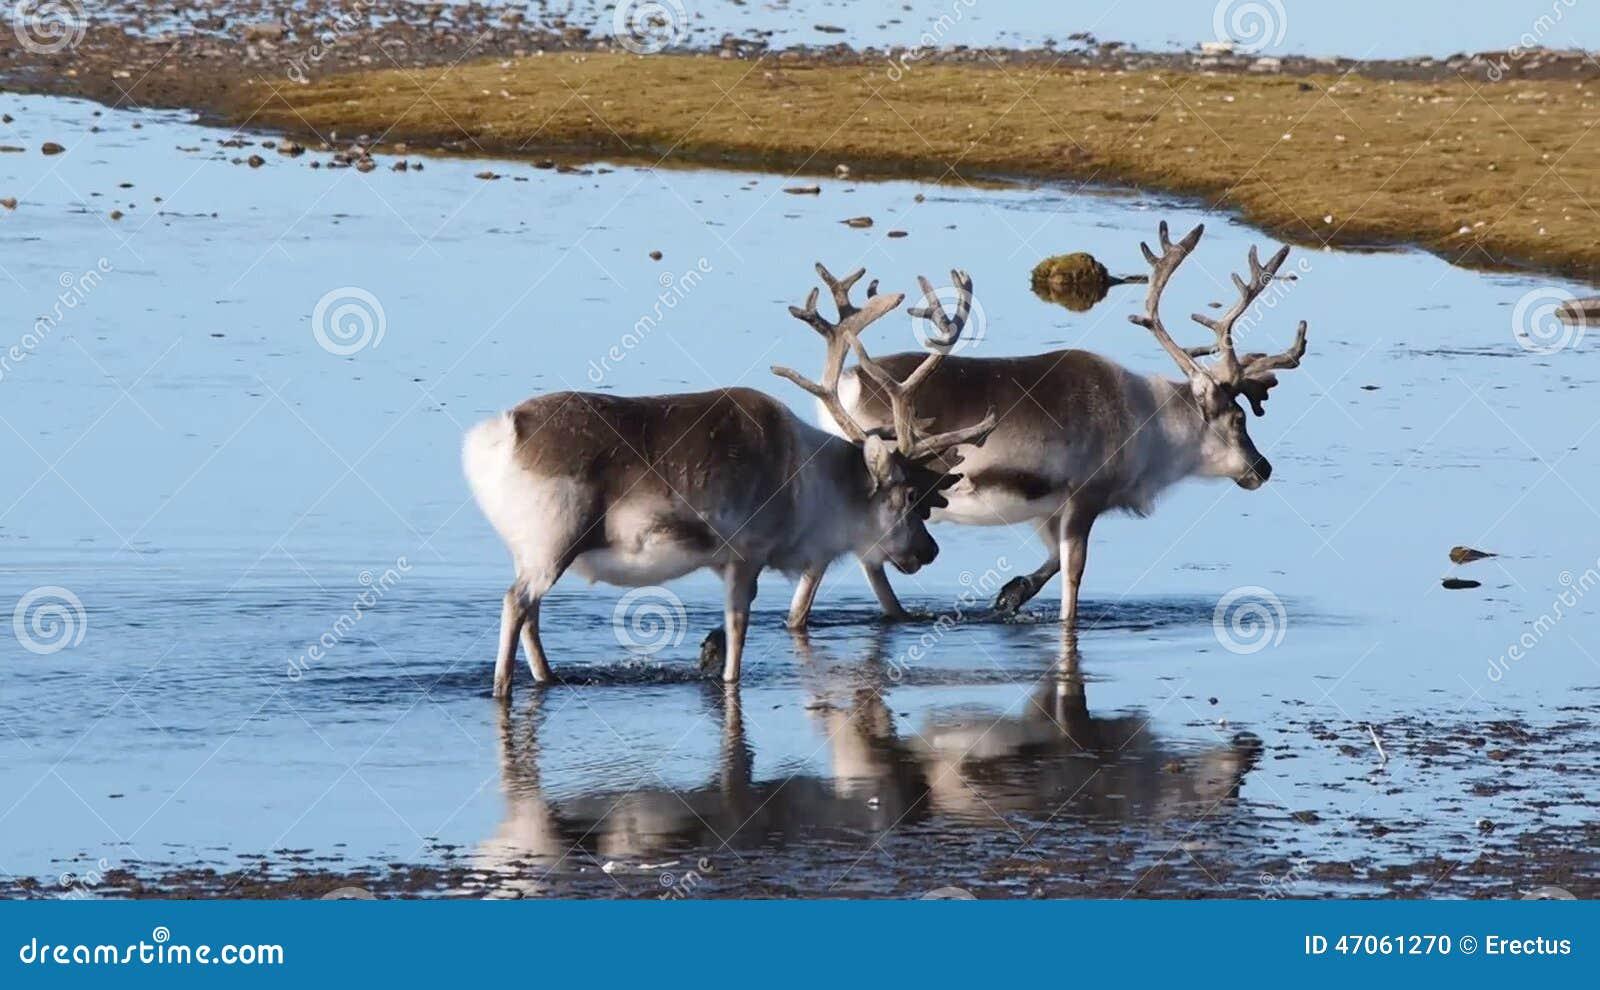 reindeer habitat images reverse search